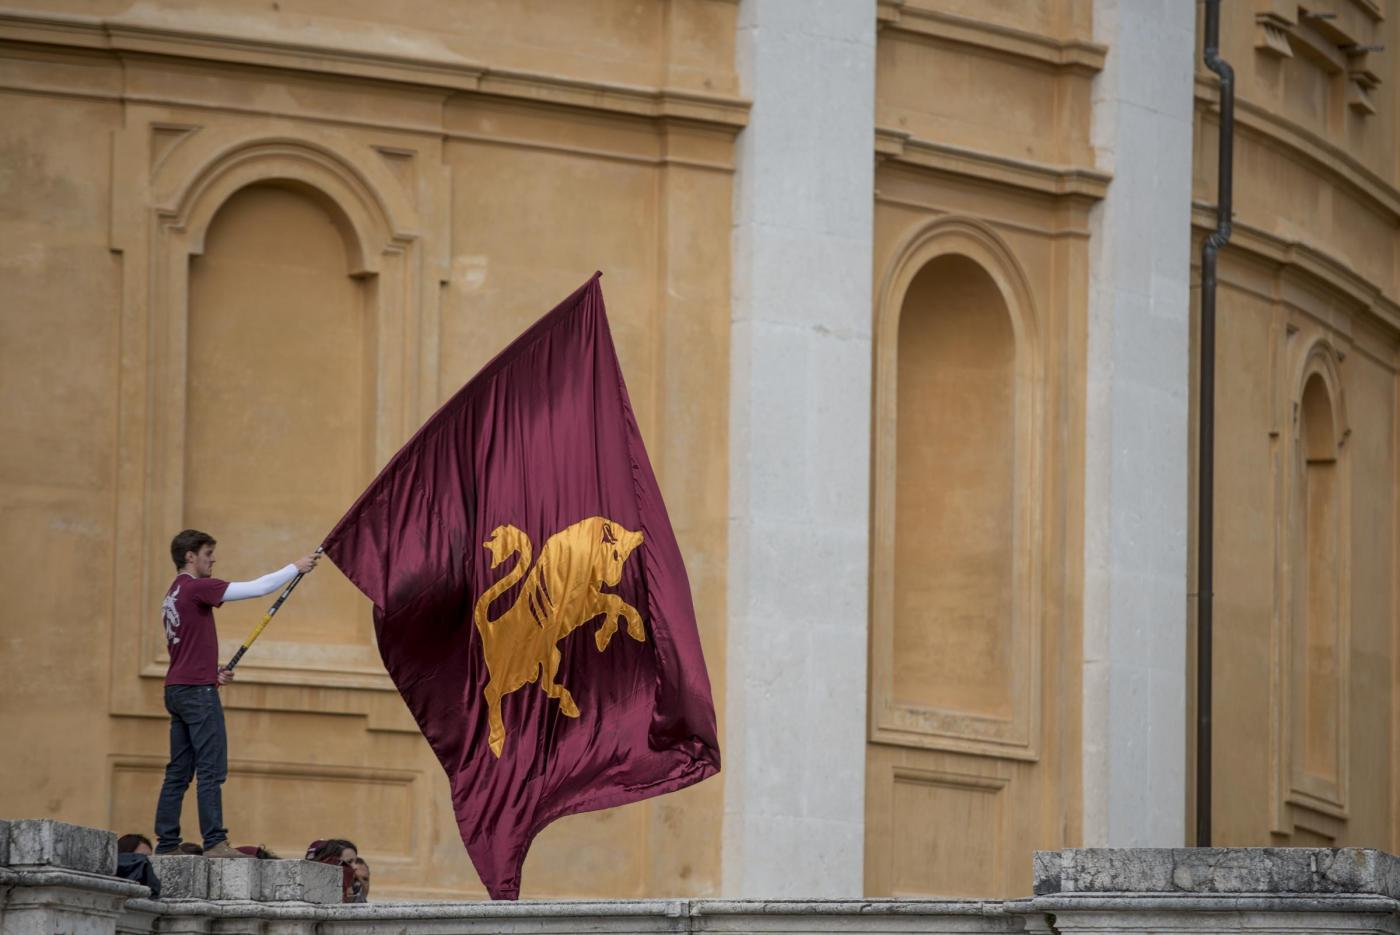 Superga: Belotti legge i nomi del Grande Torino